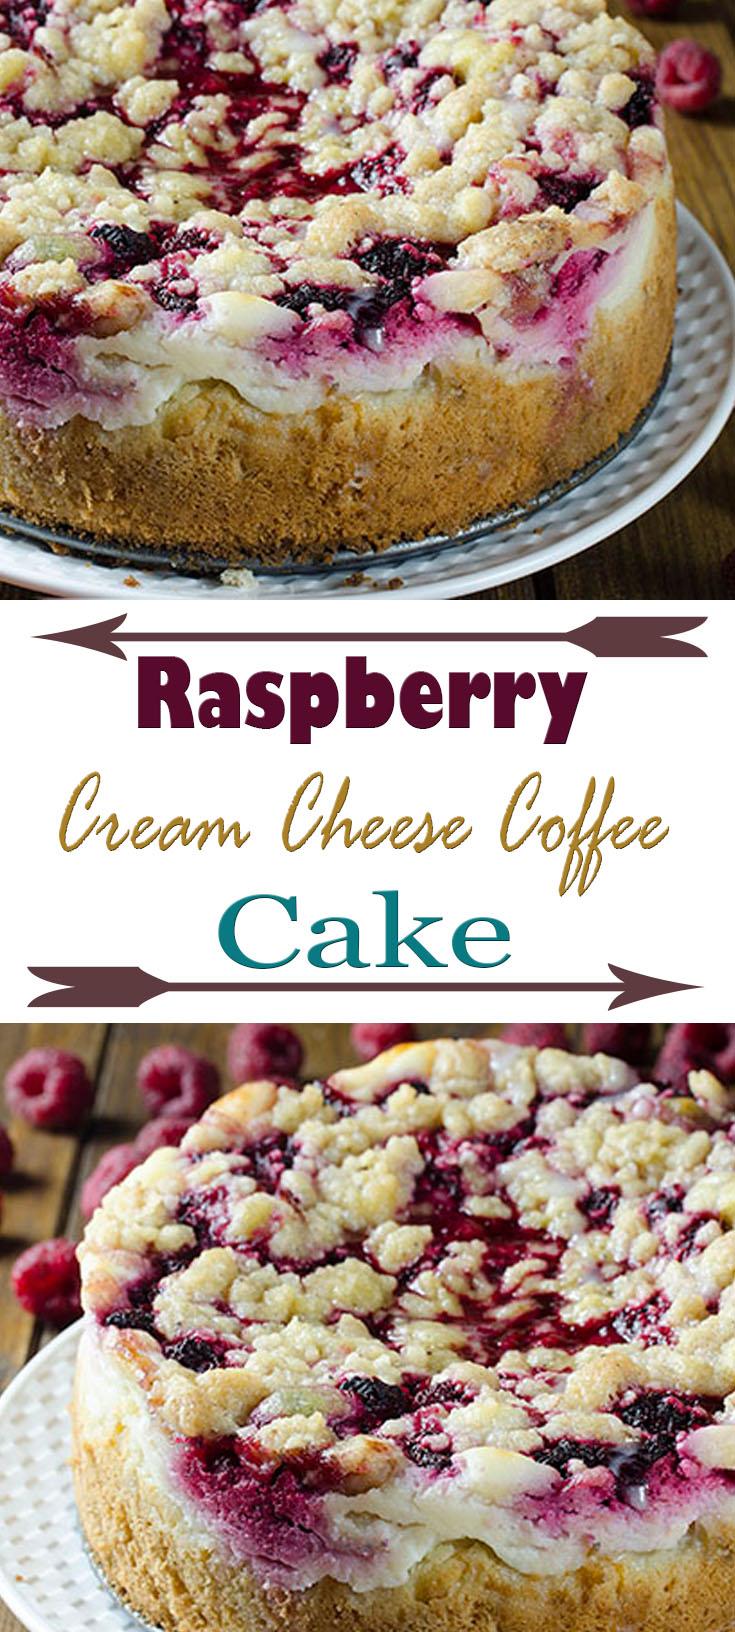 Raspberry Cream Cheese Coffee Cake r1